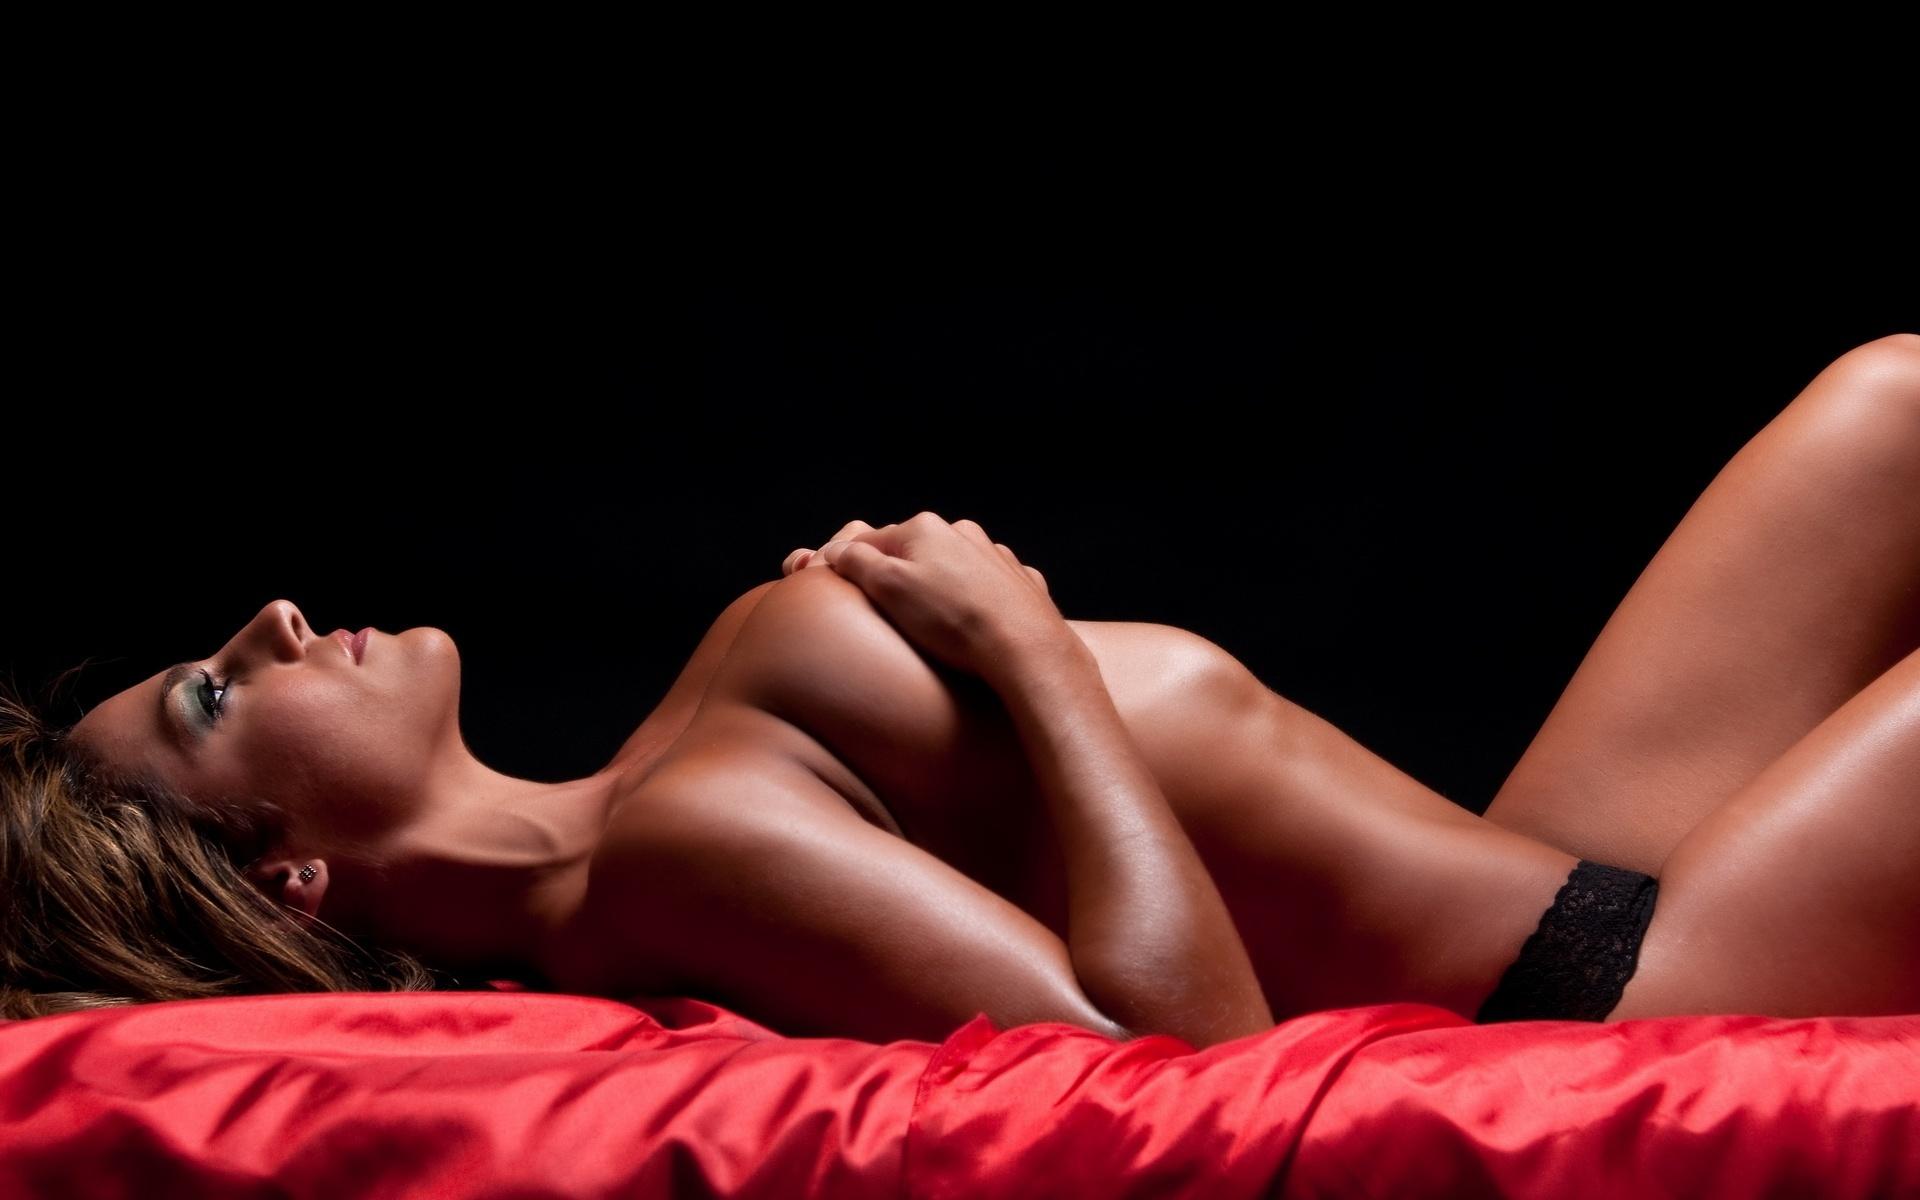 sexu-girl-poses-joanne-krupa-nude